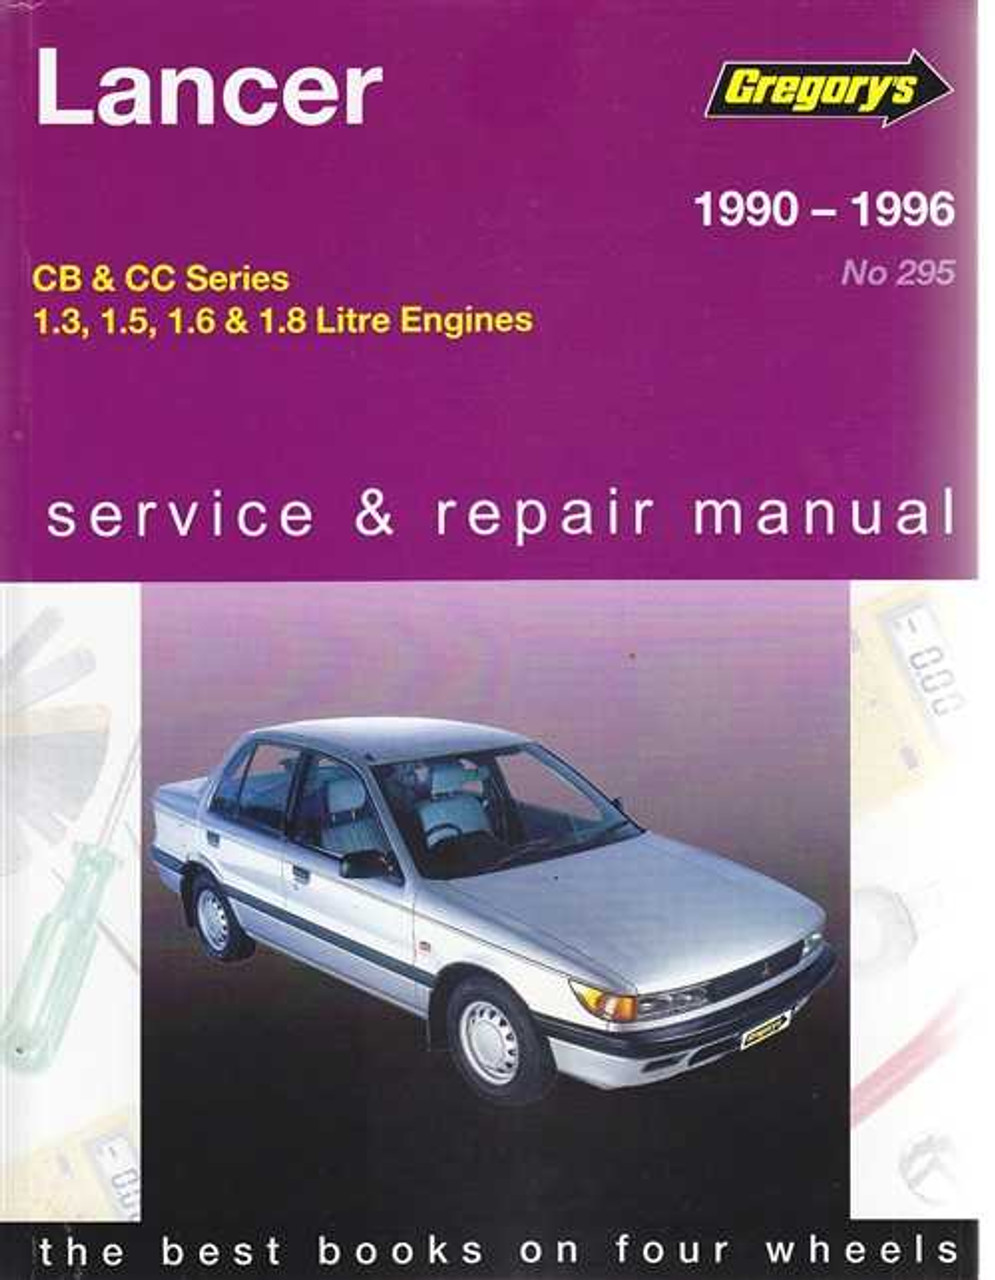 Mitsubishi lancer cb cc petrol 1990 1996 workshop manual publicscrutiny Gallery